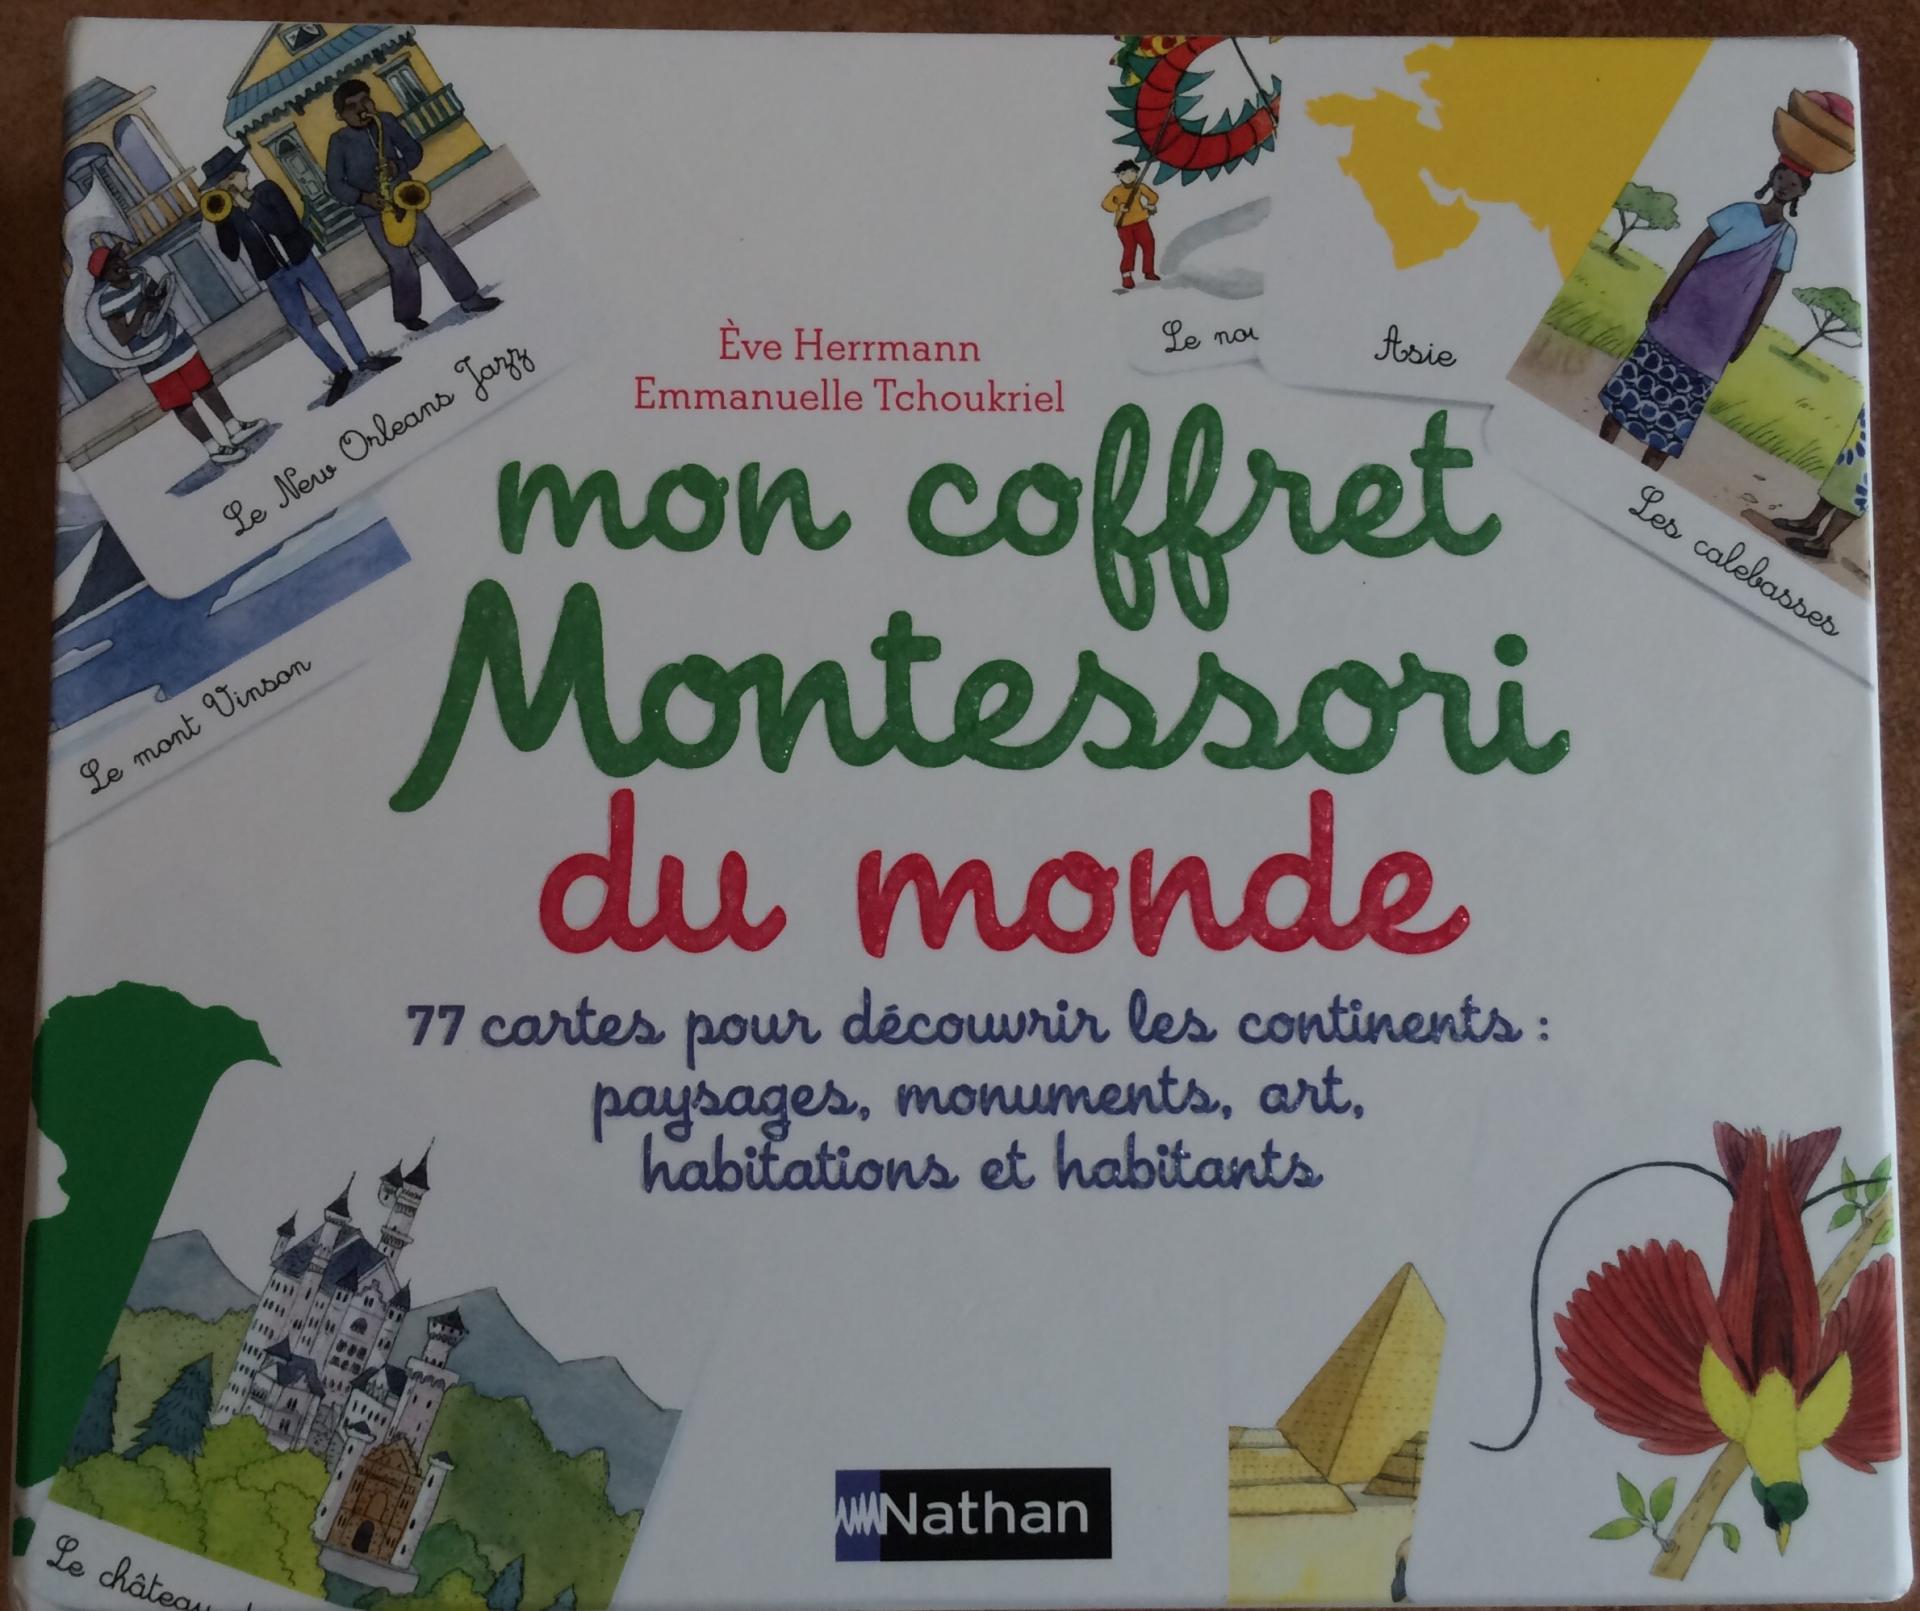 Mon coffret Montessori du monde